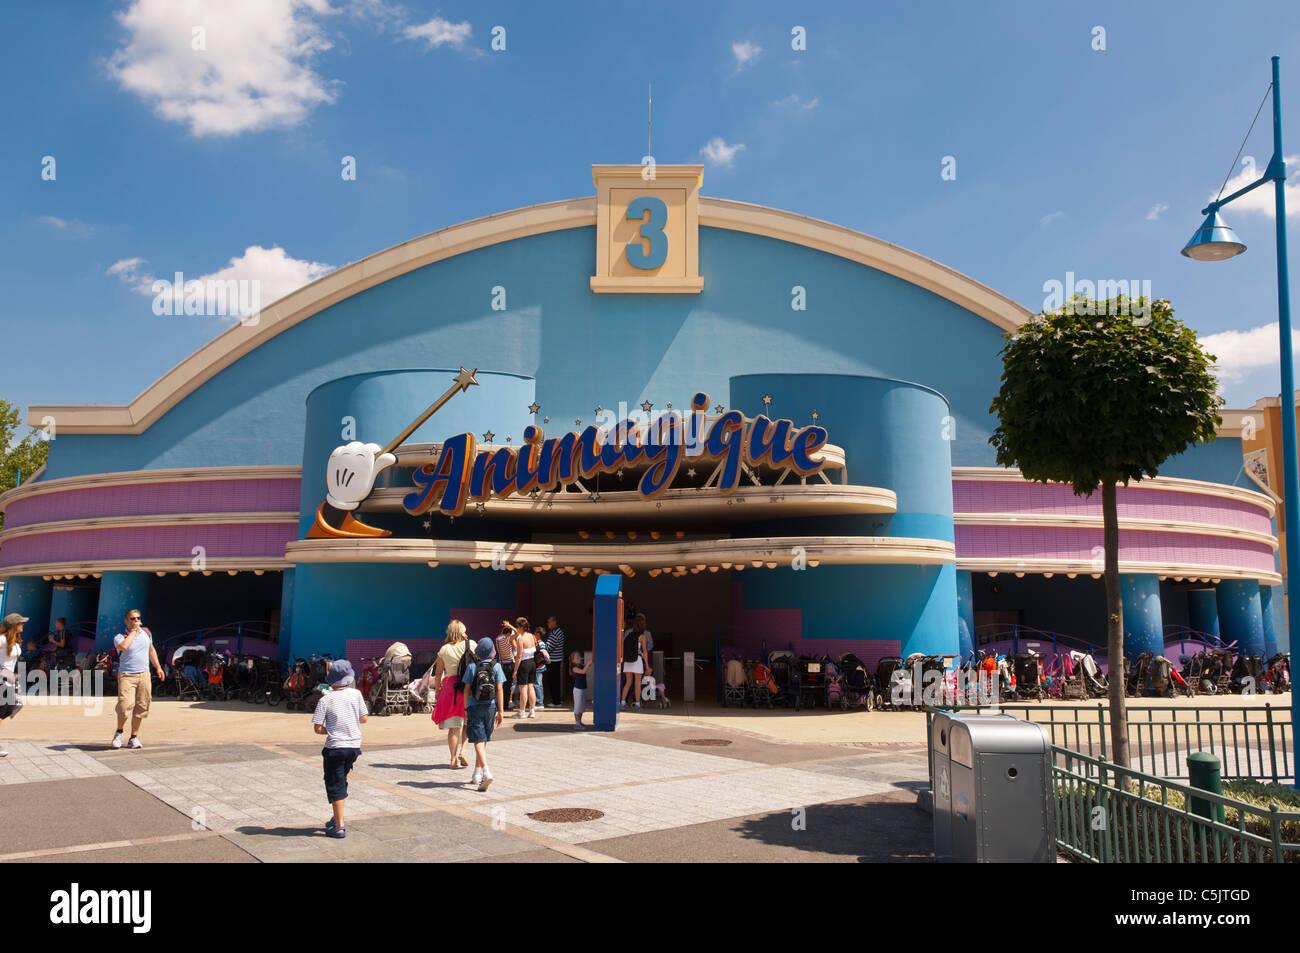 The Animagique live show at the Walt Disney Studios park at Disneyland Paris in France - Stock Image